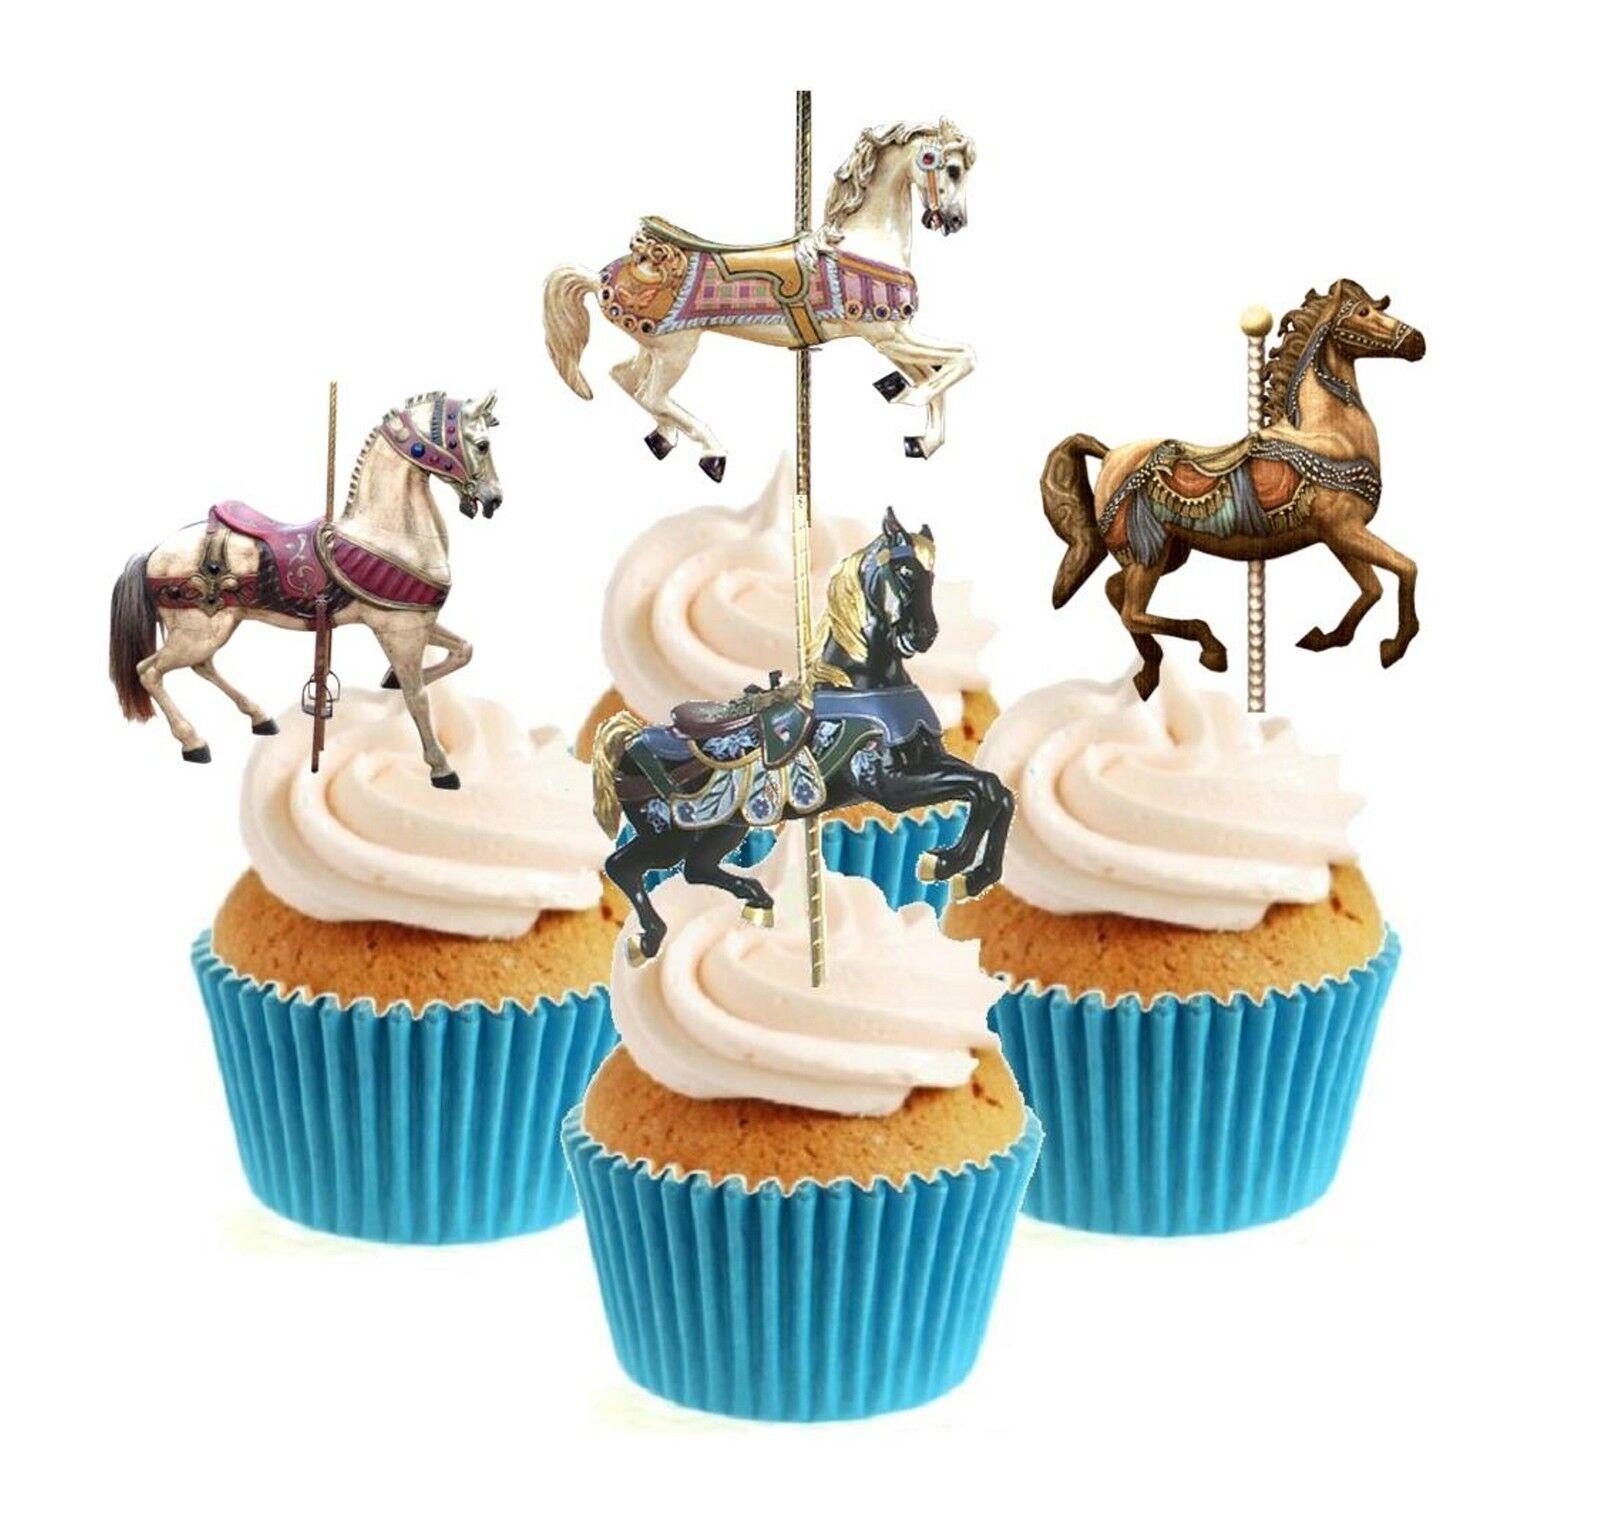 Carousel Horses For Cake Decorations  from i.ebayimg.com